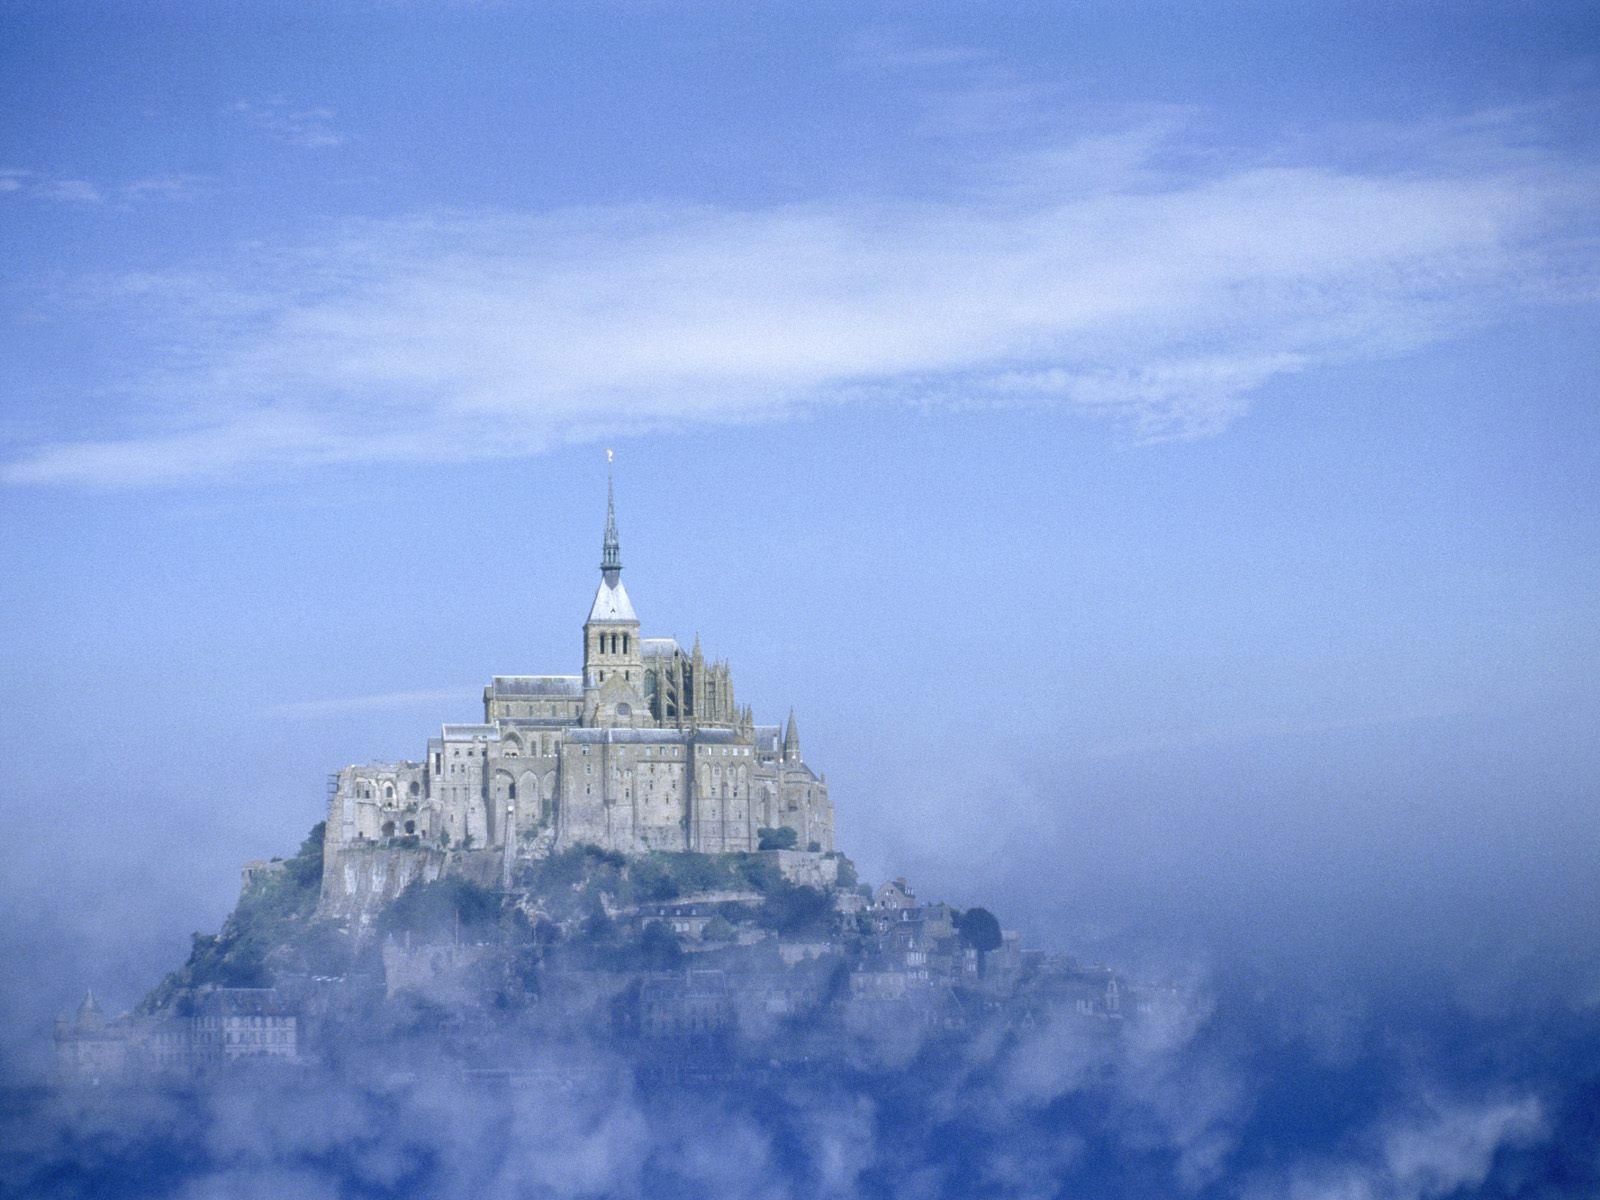 http://1.bp.blogspot.com/-hNR9mFXaeKQ/TefK9Tp6rYI/AAAAAAAAAks/jDKaqzSvHaY/s1600/Mont+Saint+Michel+Abbey%252C+France.jpg